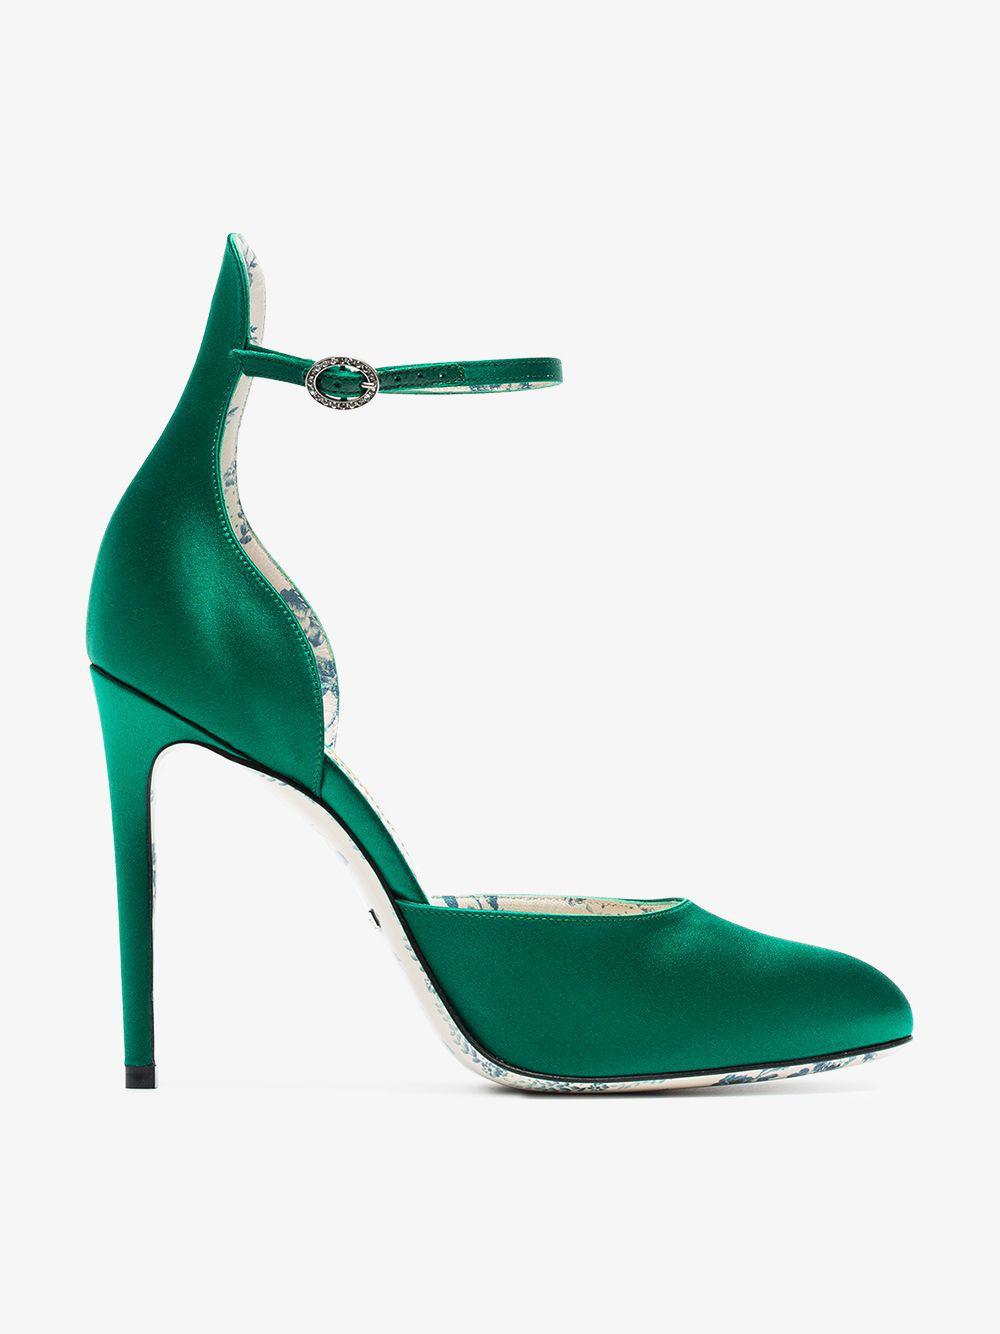 Gucci Satin Pumps in Green - Lyst